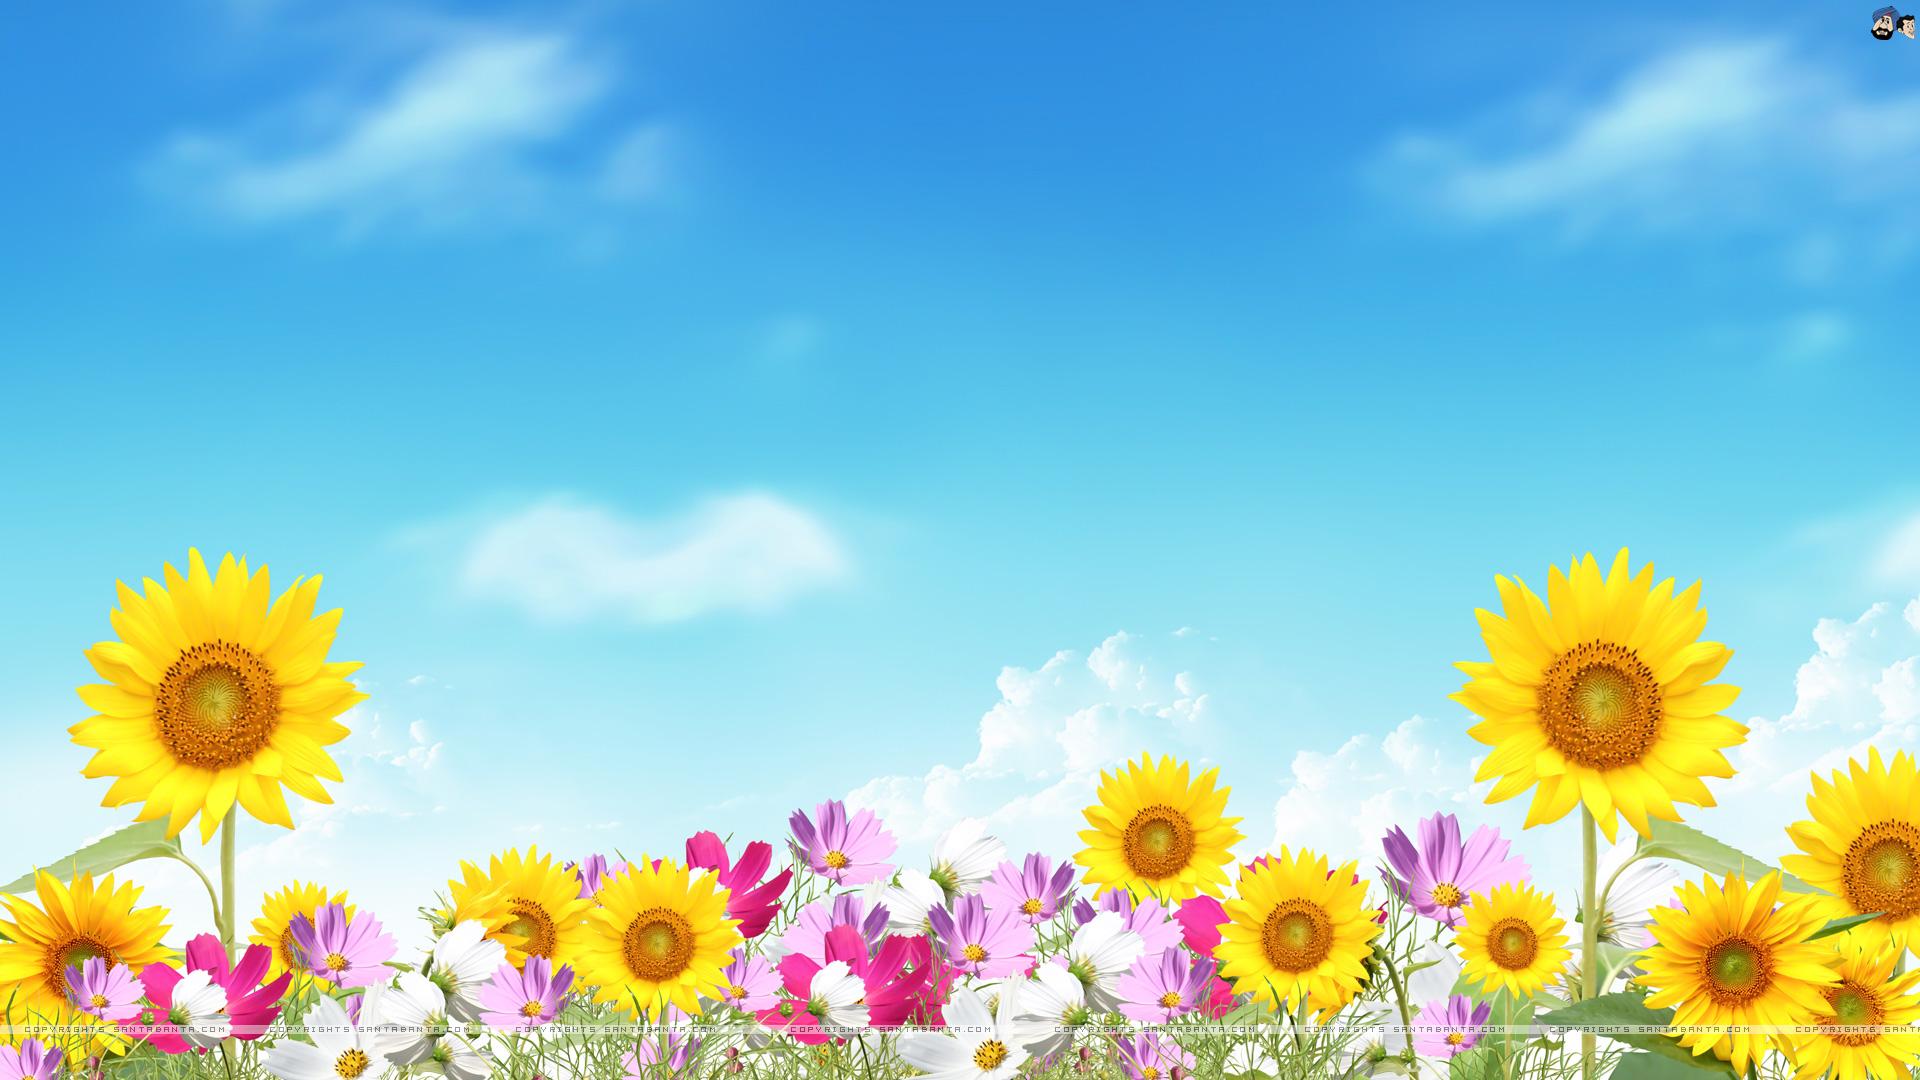 Sunflower Daisy Cosmos Digital Art 1920x1080 1920x1080